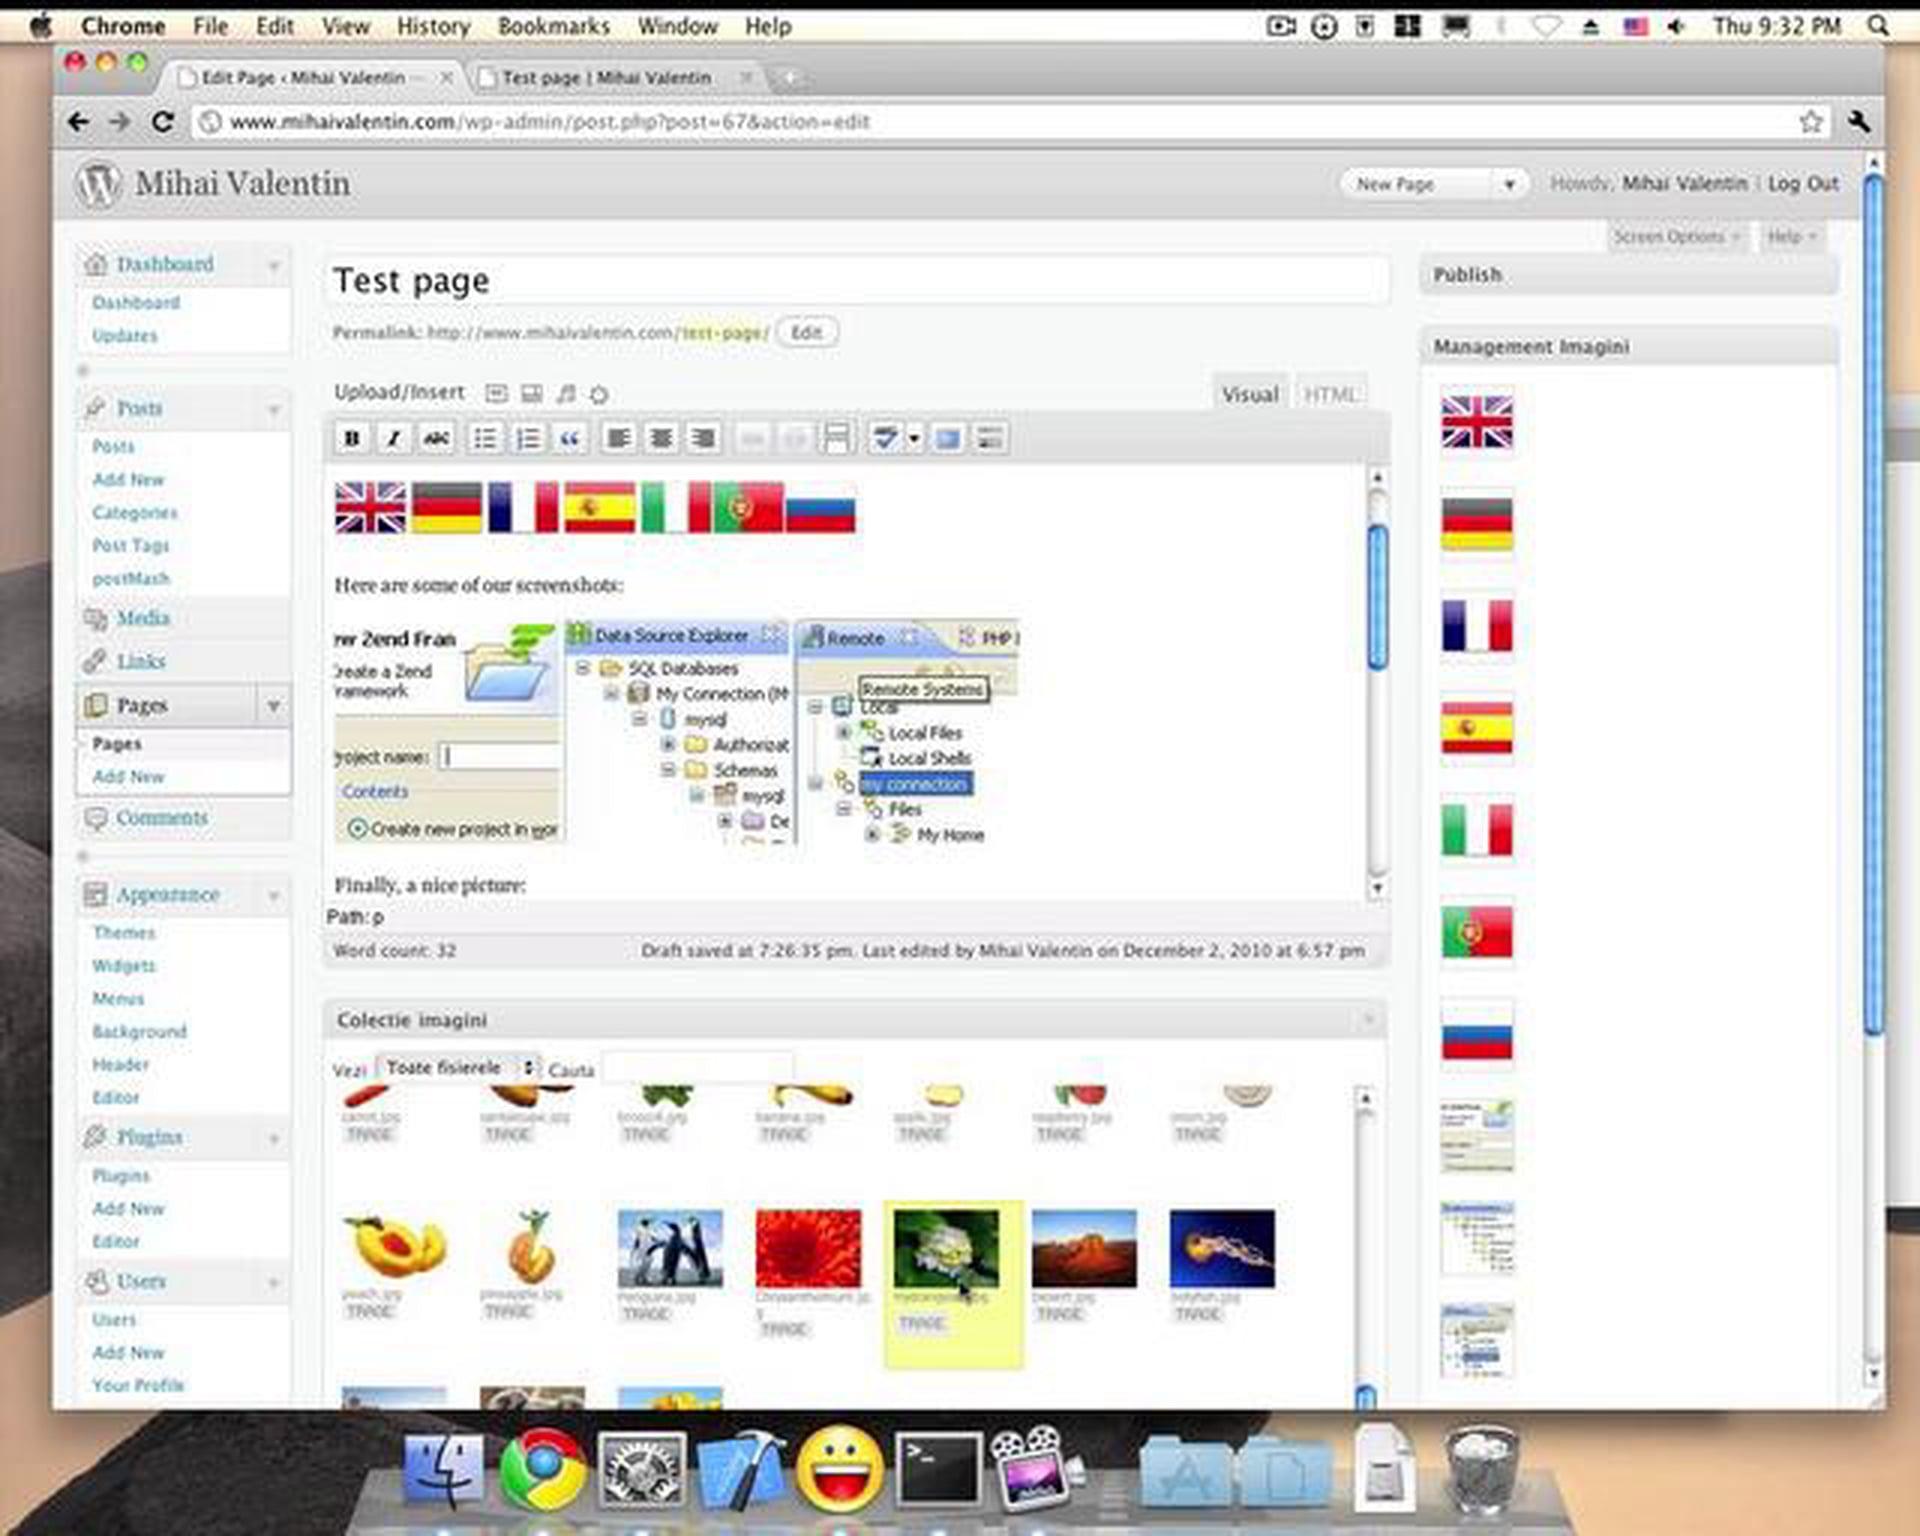 WordPress Image Management plugin